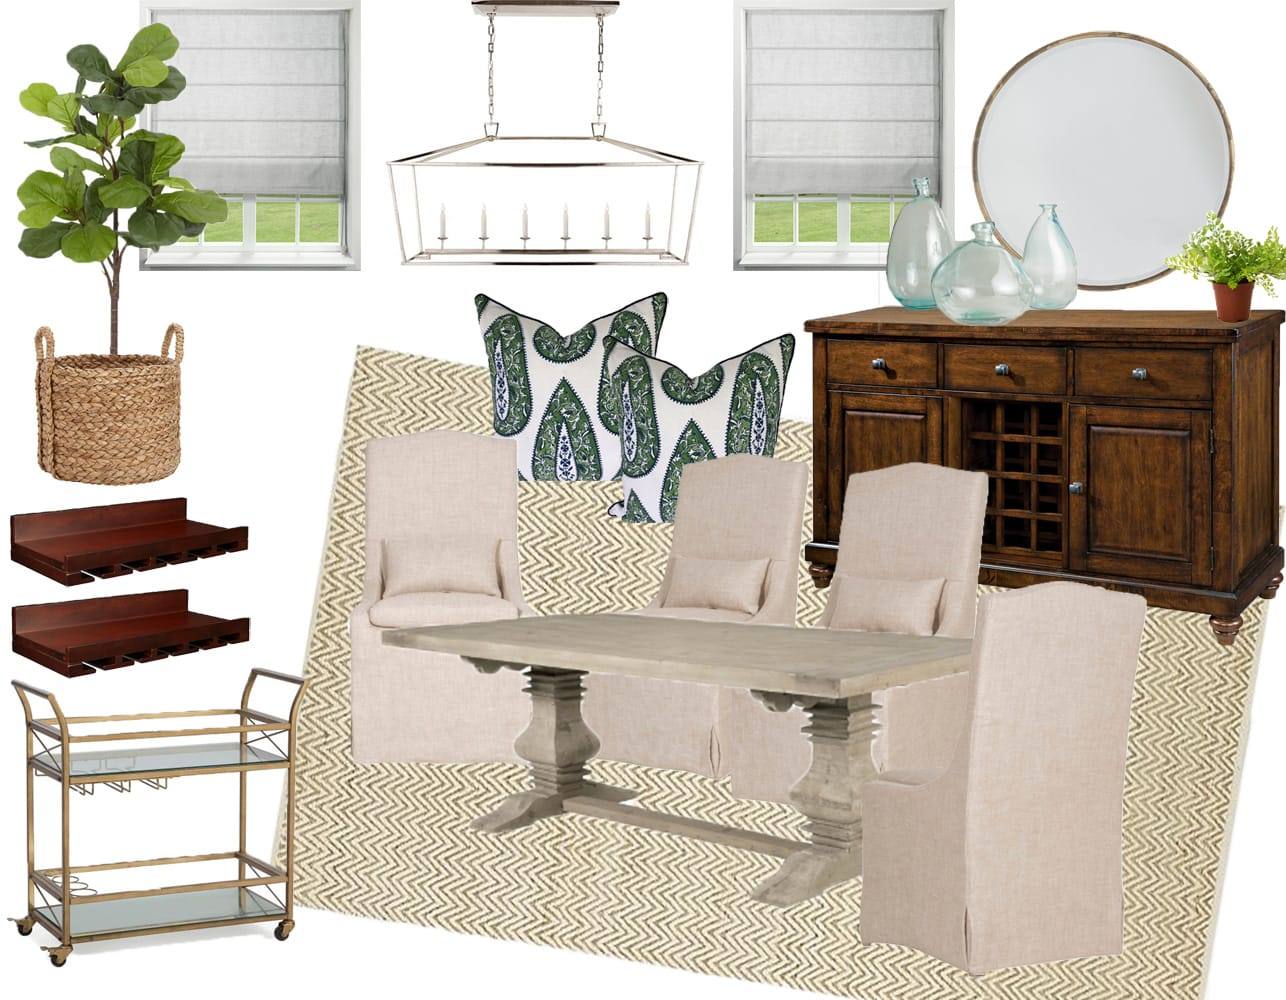 One room challenge dining room makeover 2 life on for Room design challenge